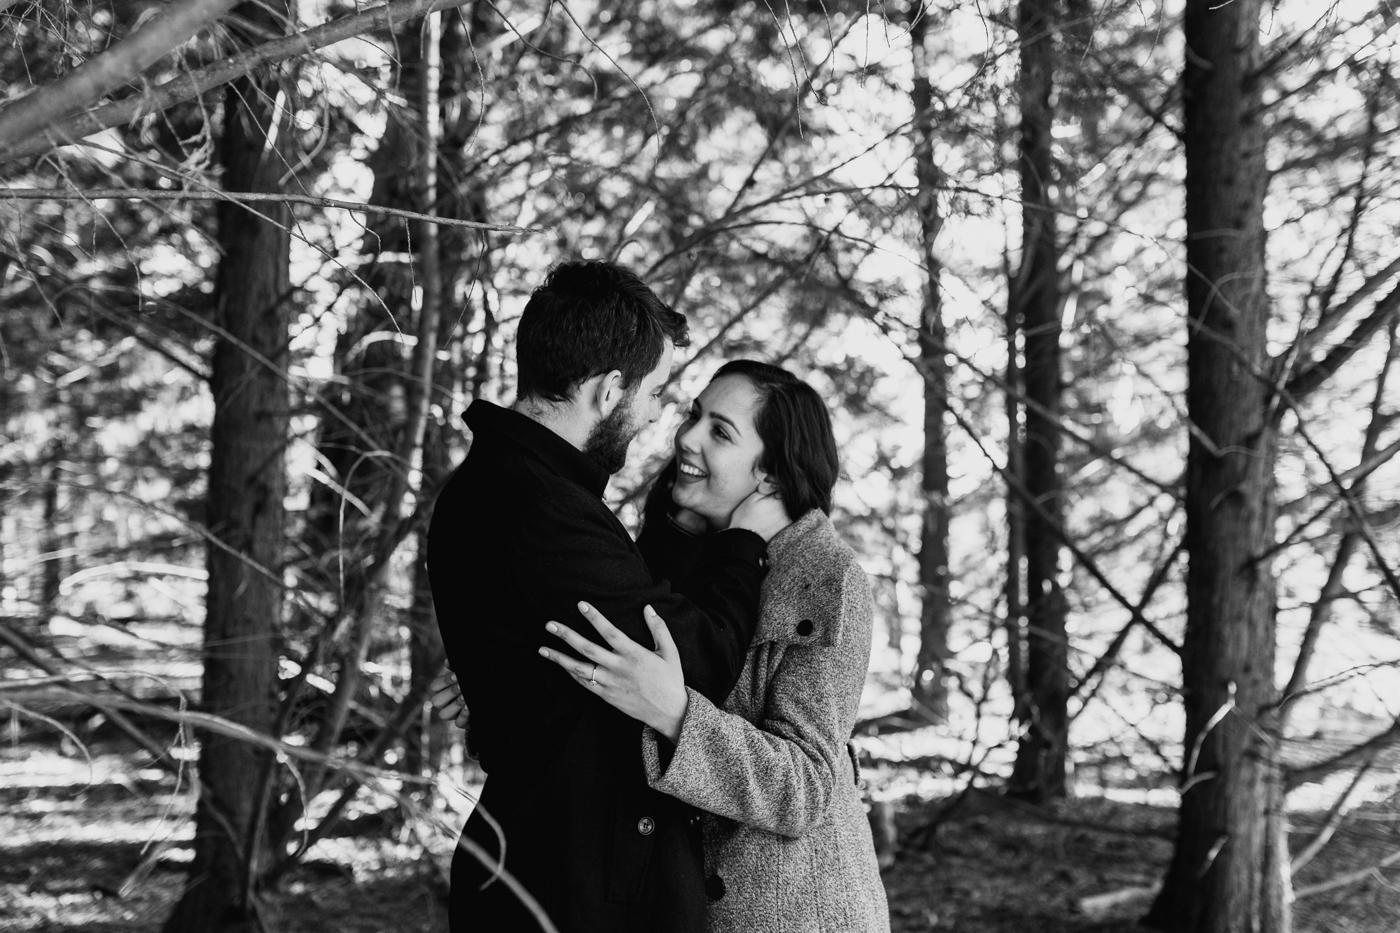 Kate & Kieran - Southern Highlands Engagement - Samantha Heather Photography-47.jpg